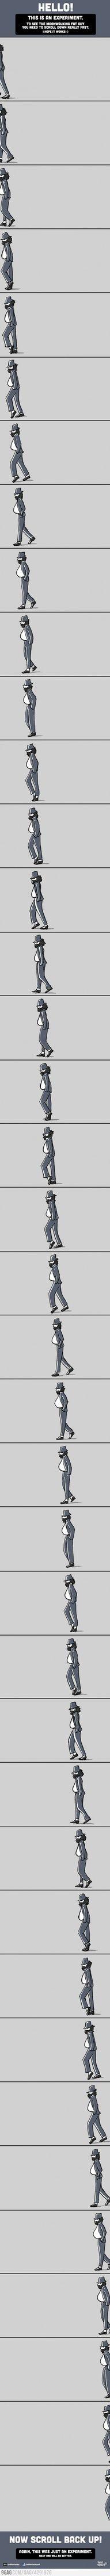 Moonwalk Experiment